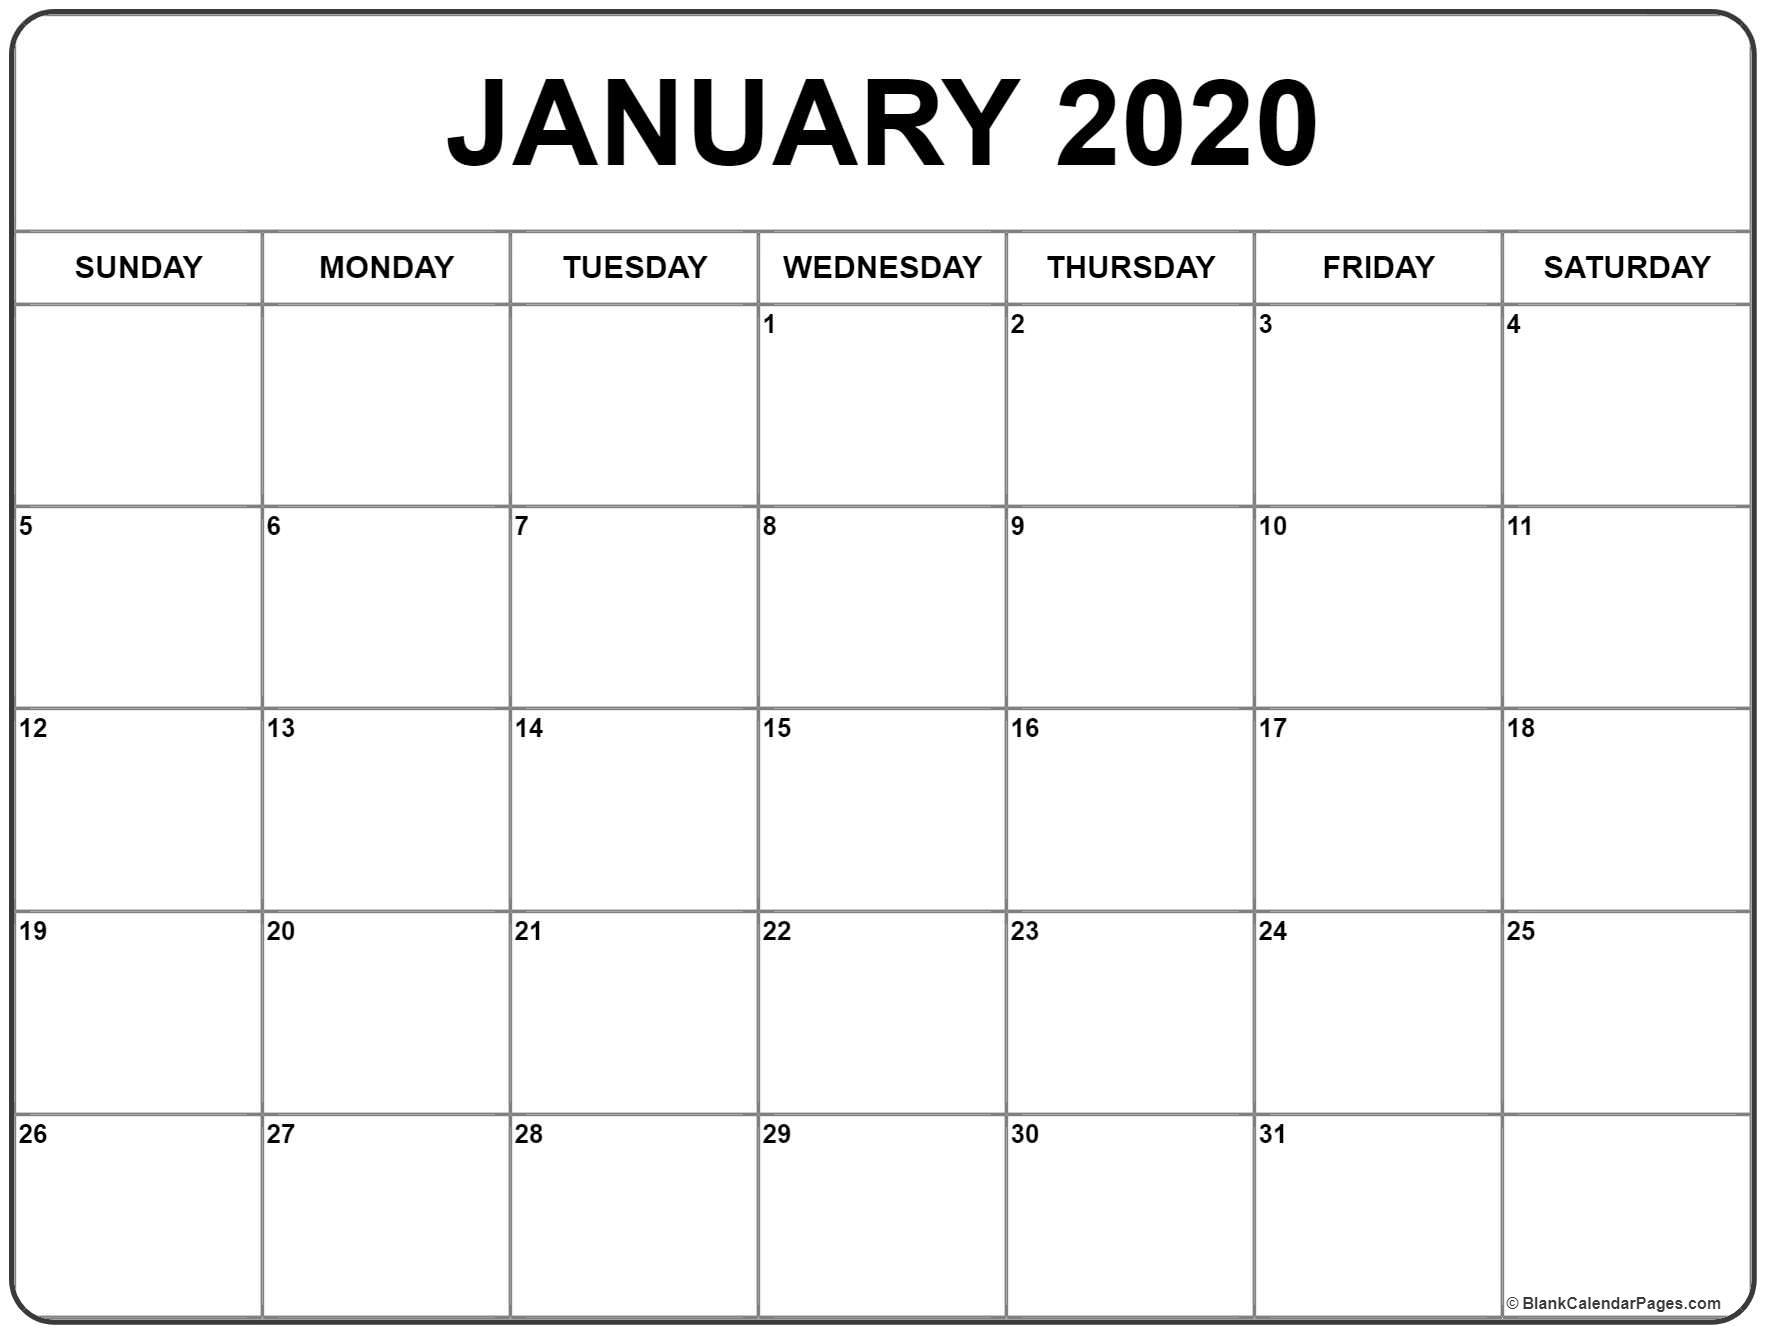 January 2020 Calendar | Free Printable Monthly Calendars inside Printable Calendar One Week Per Page 2020